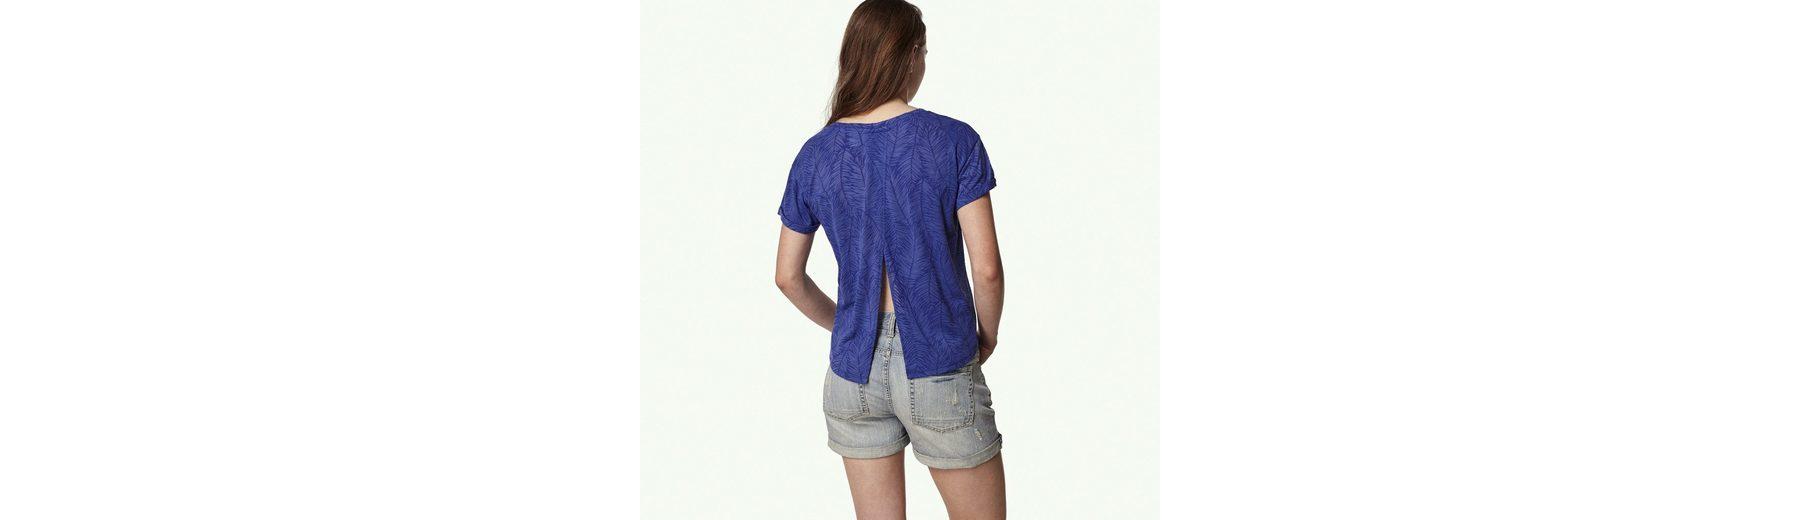 O'Neill T-Shirts kurzärmlig Crop split back t-shirt Sneakernews Verkauf Online Billig Kaufen Outlet Besten Großhandel Rabatt Professionelle iZ5HUP